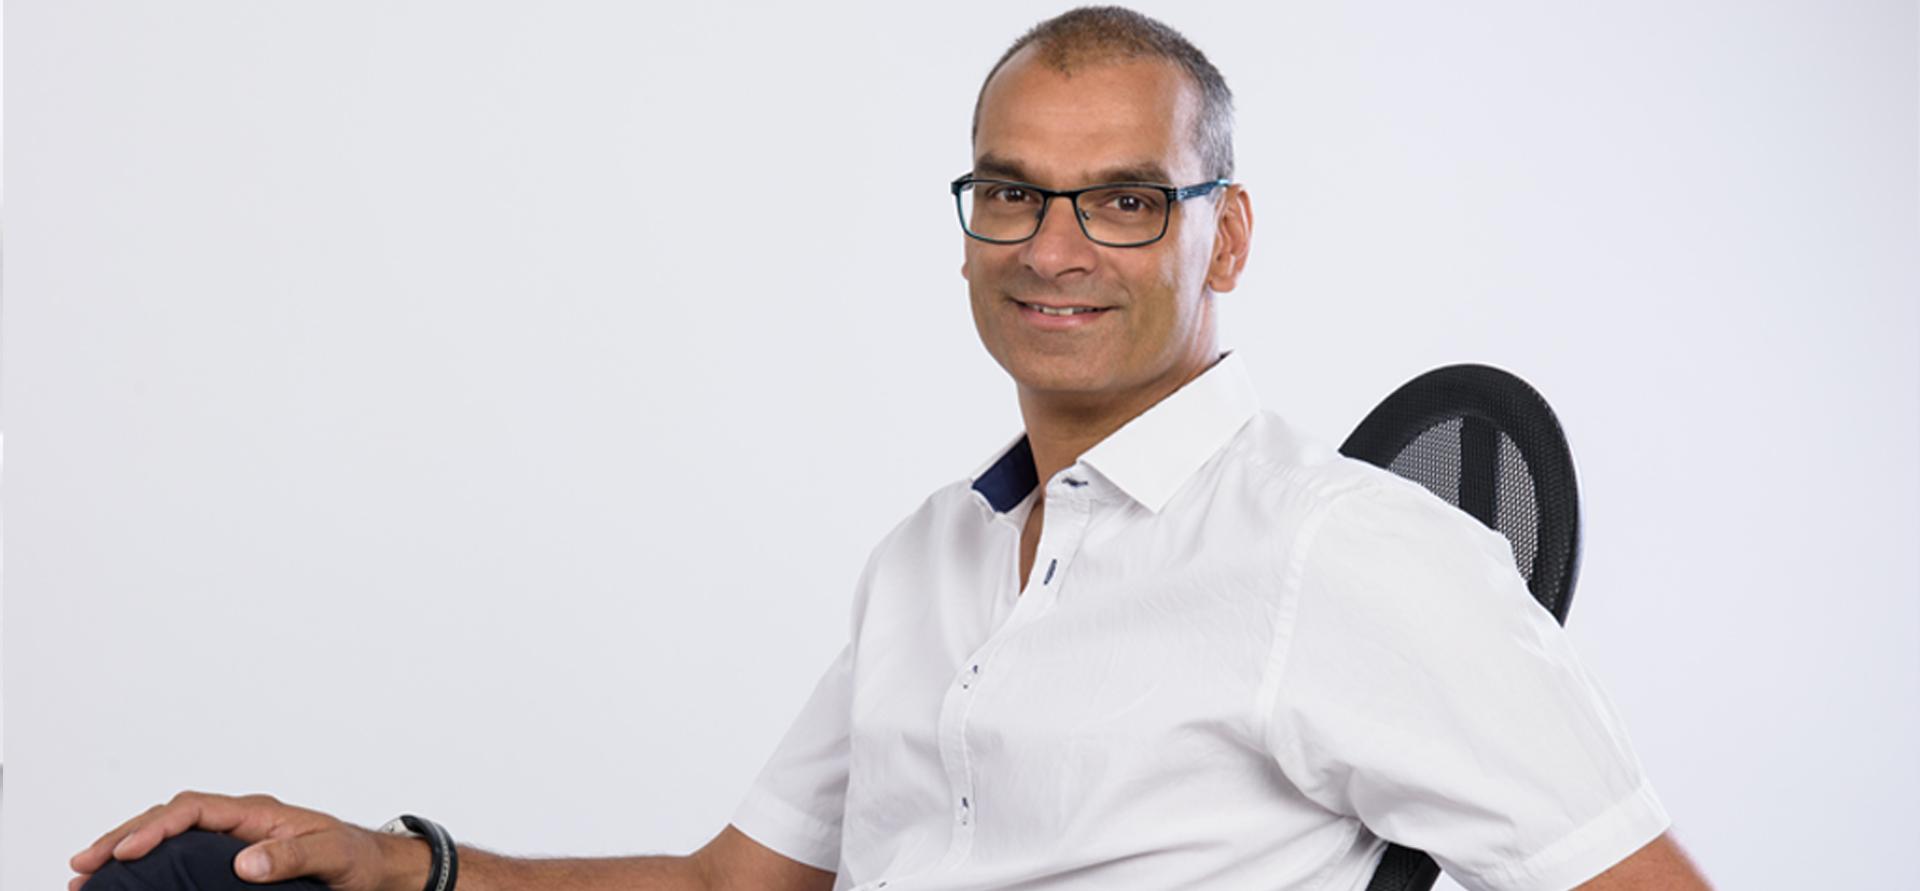 dr.-Martin-raghunath_slider_2019